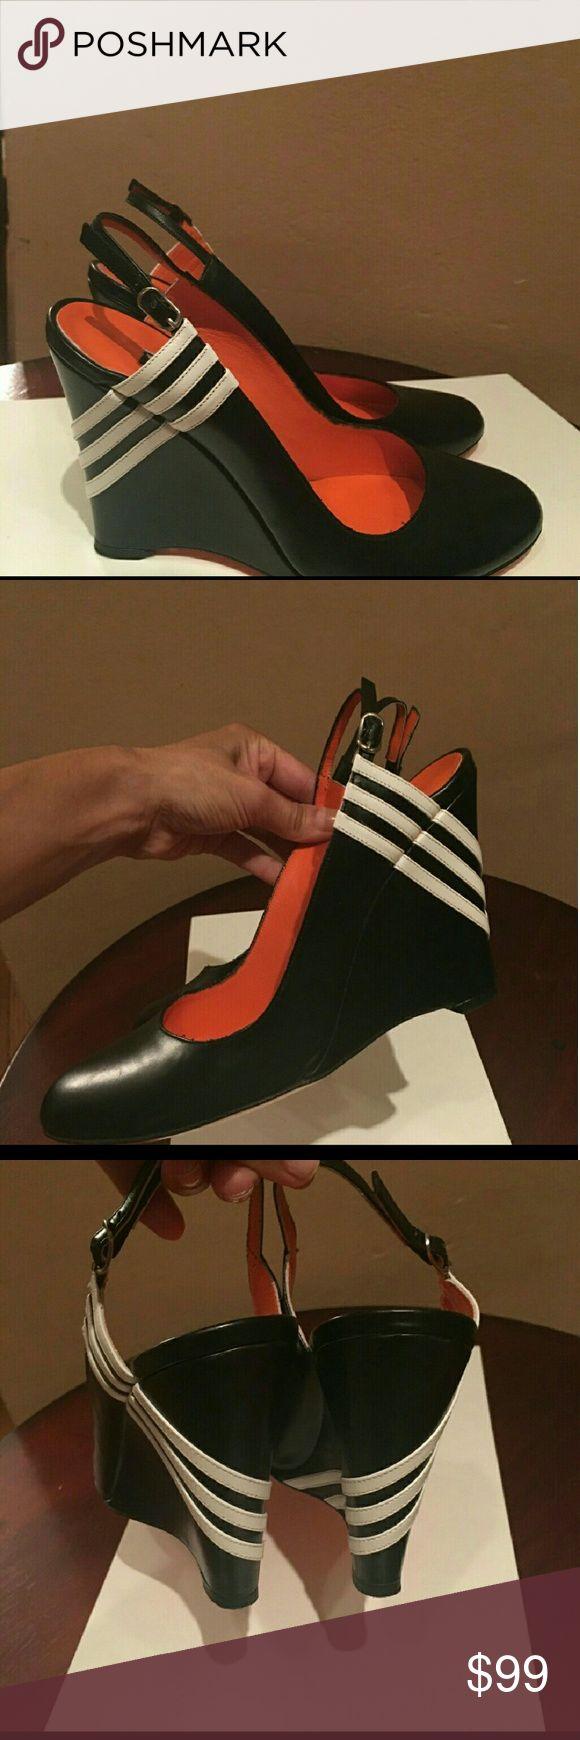 Stunning Yohji Yamamoto  shoes Beautiful Wedge, in excellent condition Yohji Yamamoto Shoes Wedges